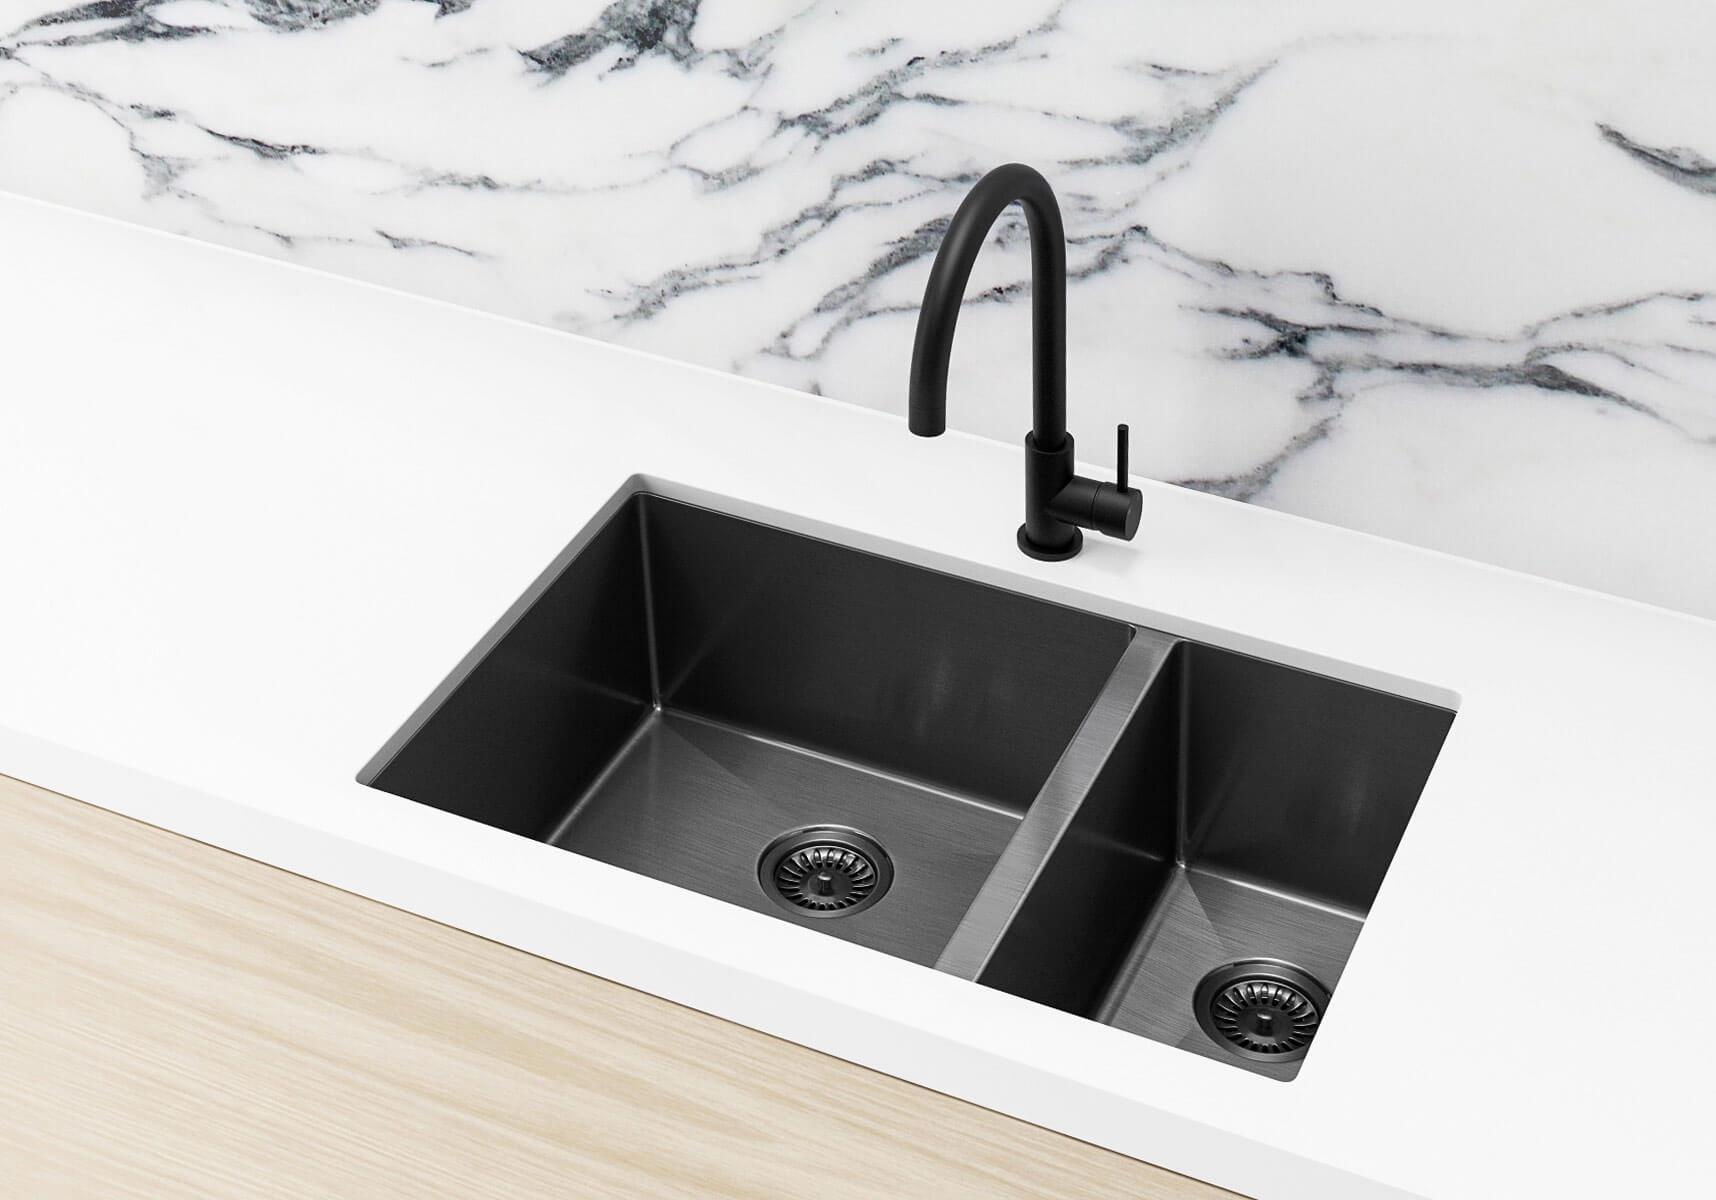 Stainless Steel Double Bowl PVD Kitchen Sink - Brushed Gun Metal (Nano)  670x440x200mm